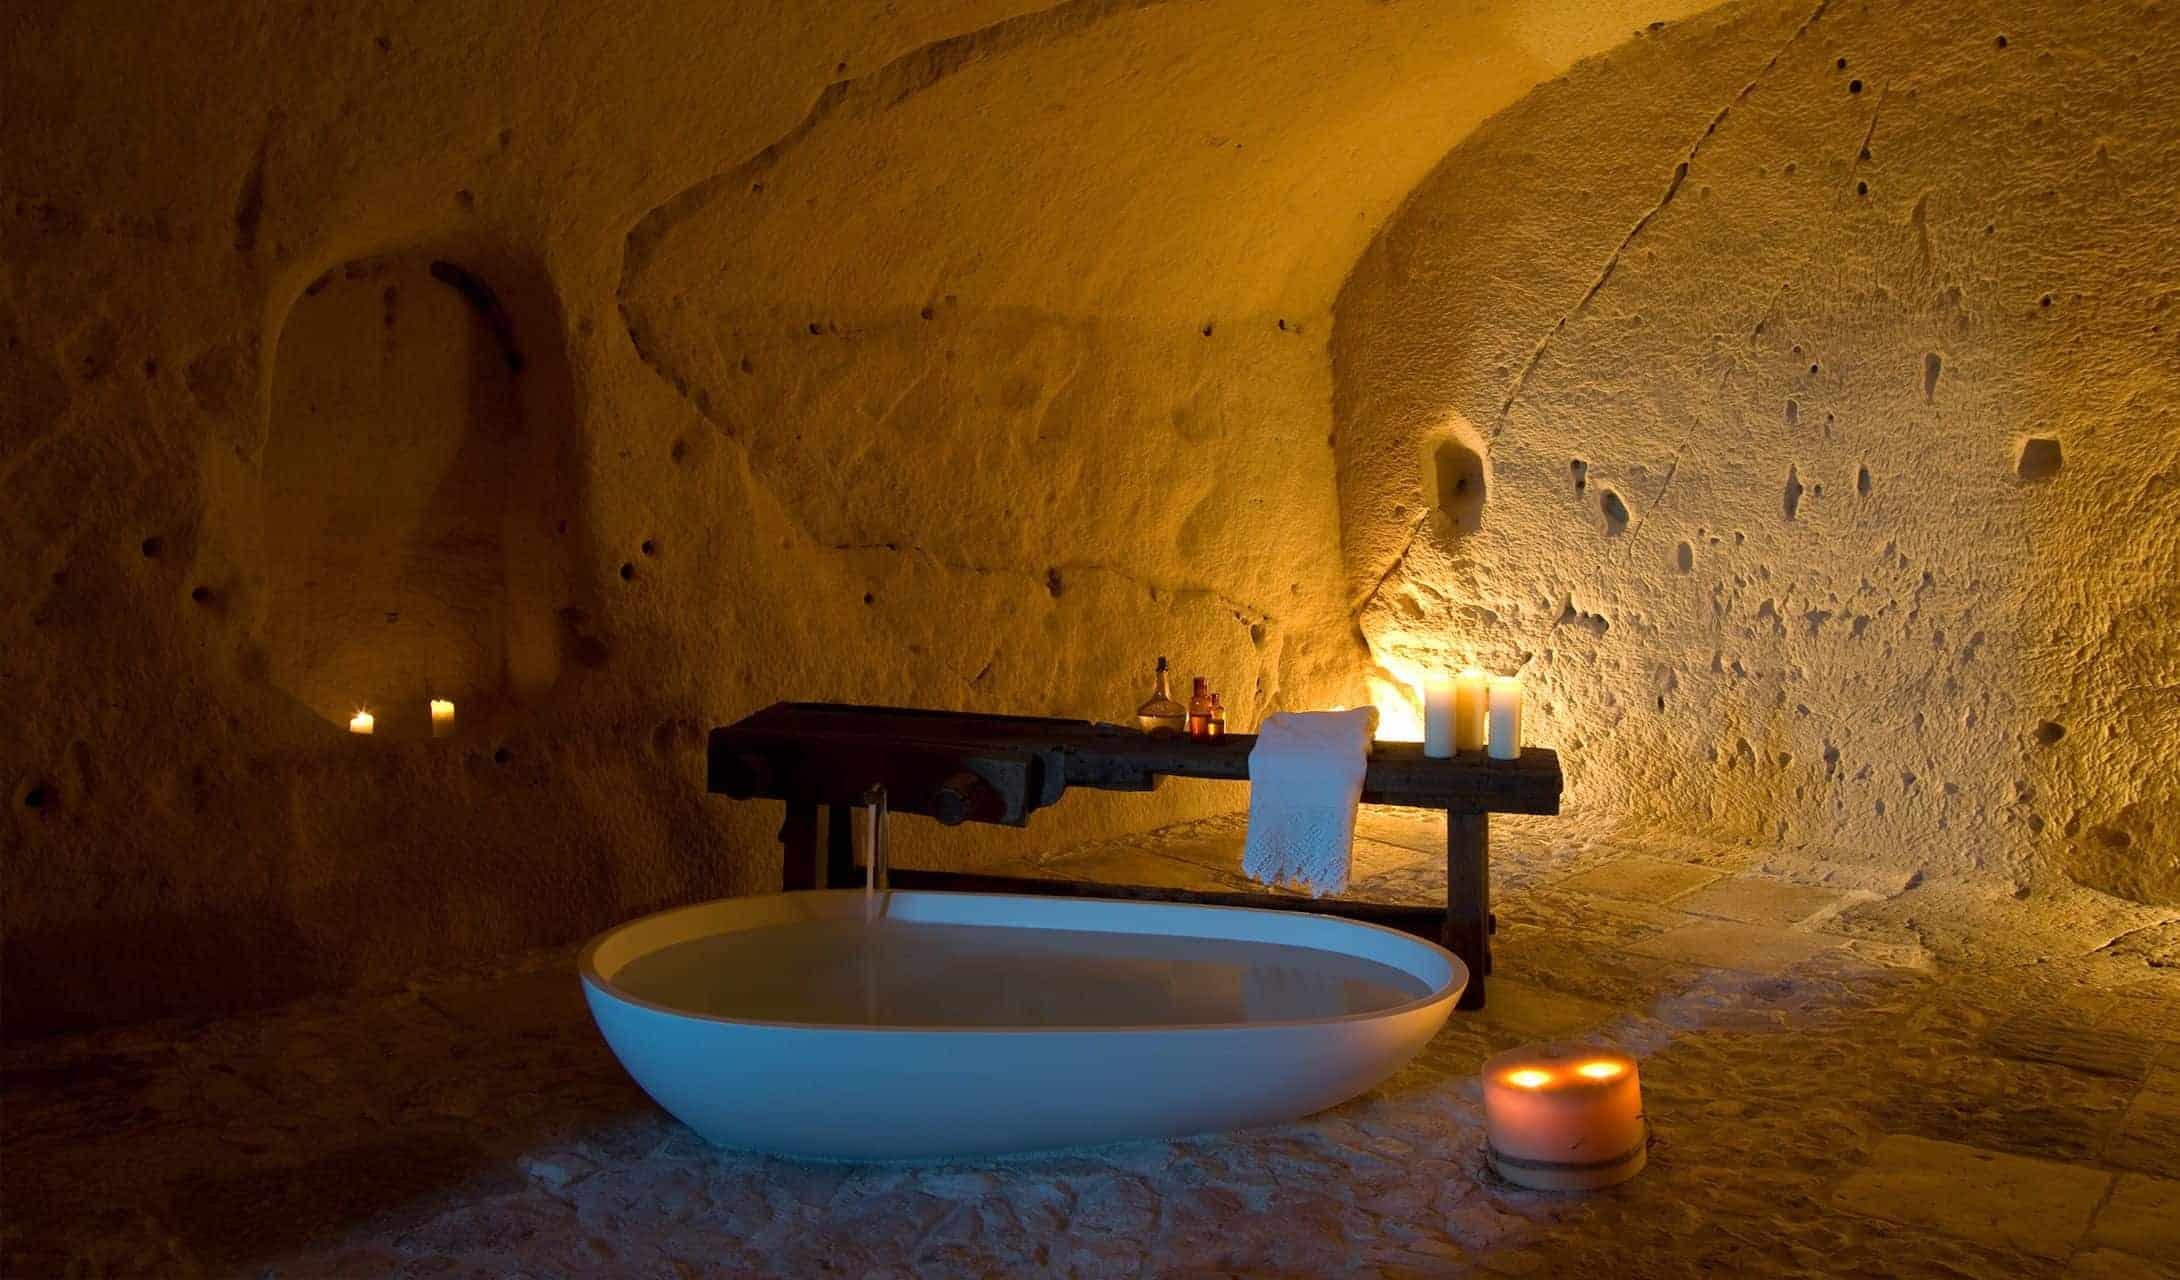 honeymoon Europe South Italy Le Grotte della Civita